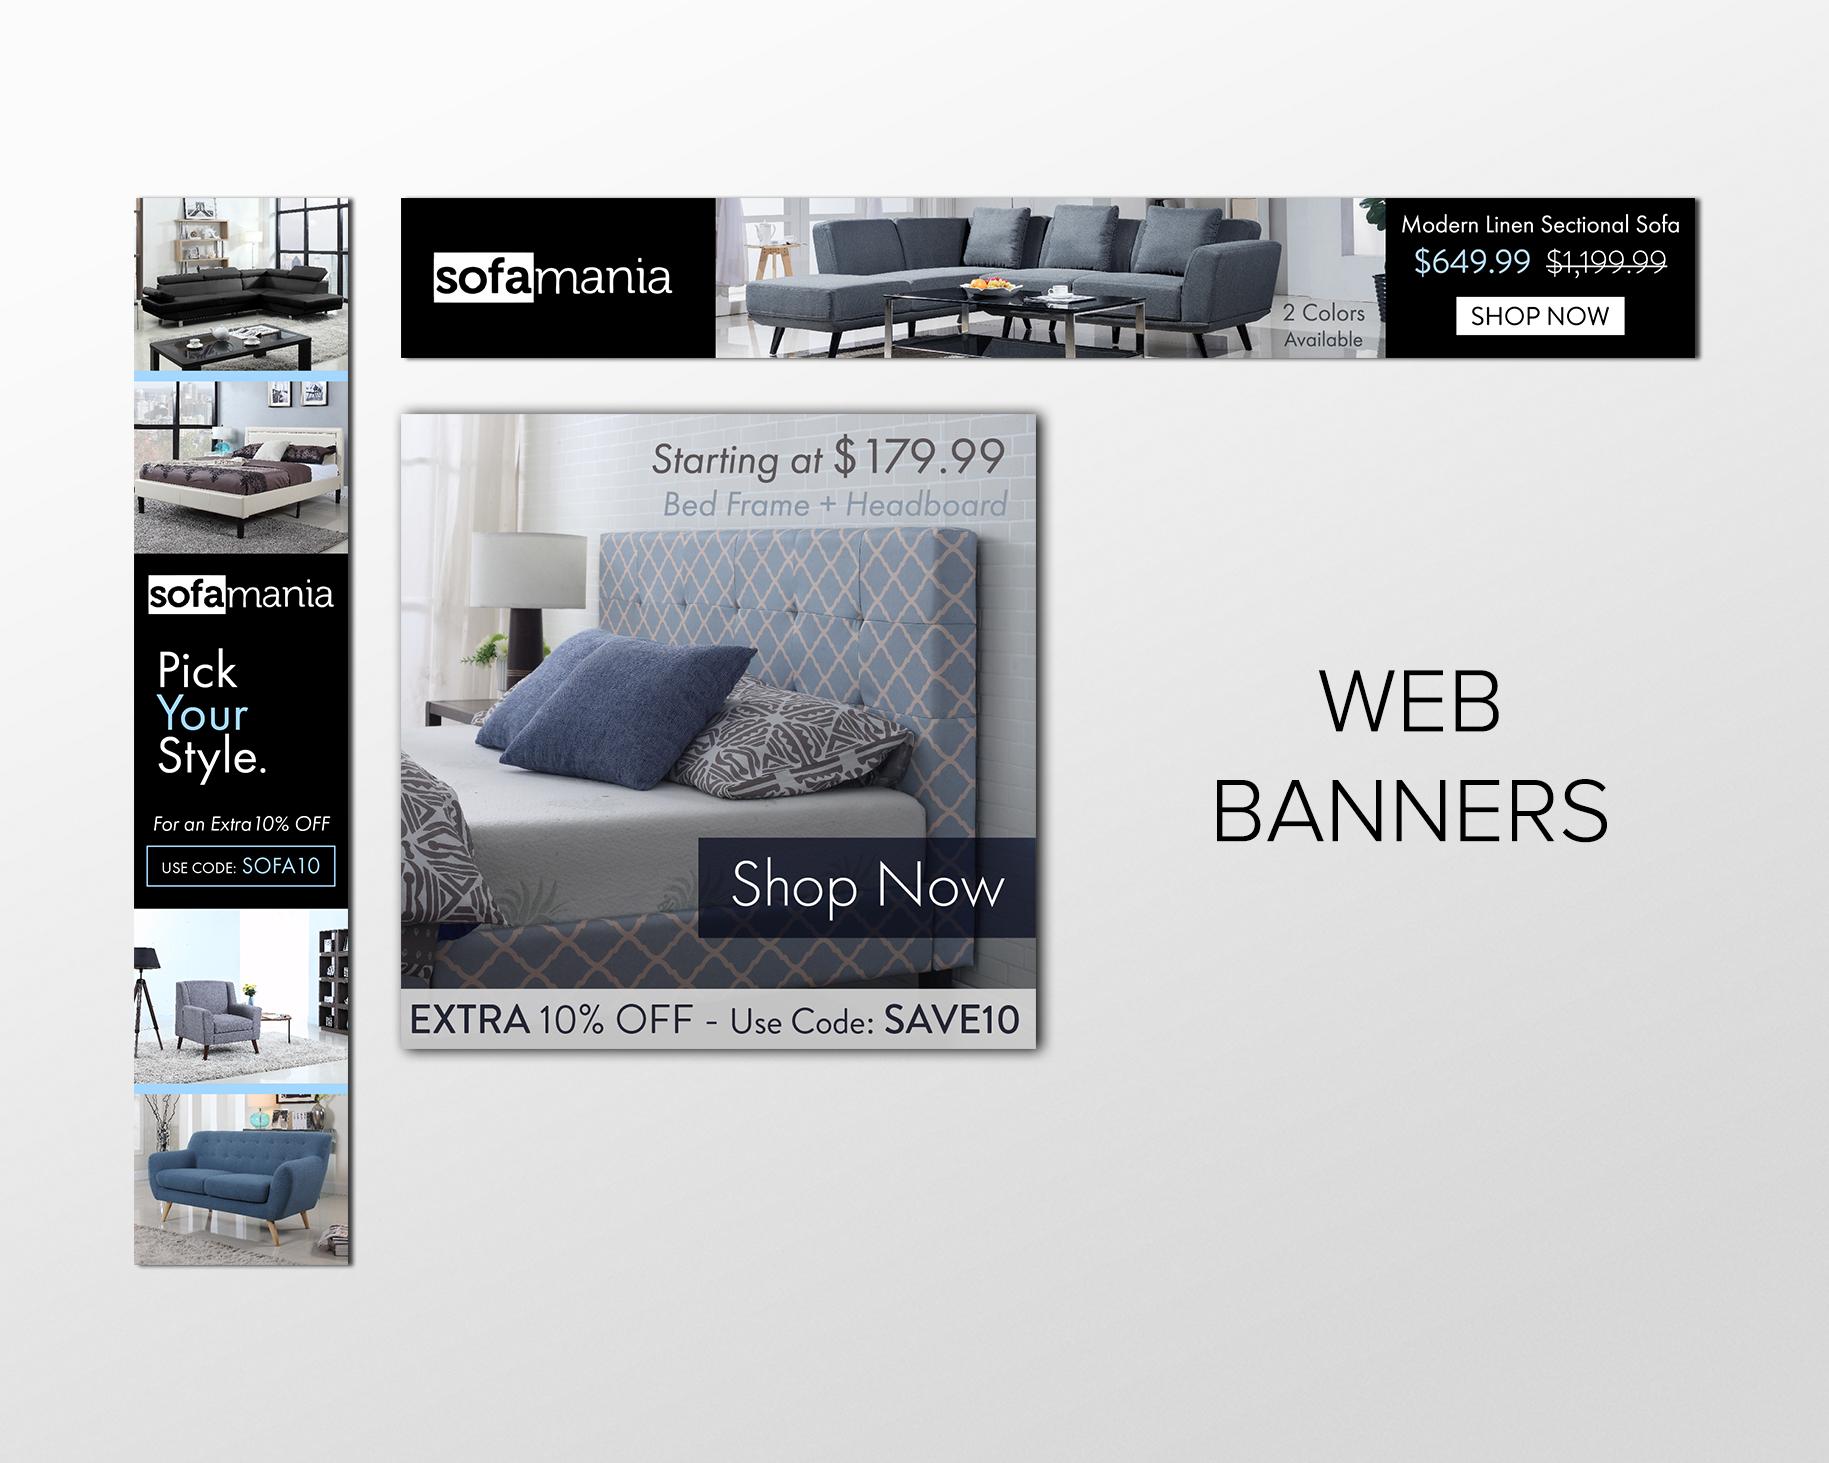 Web-Banners-Image-1.jpg